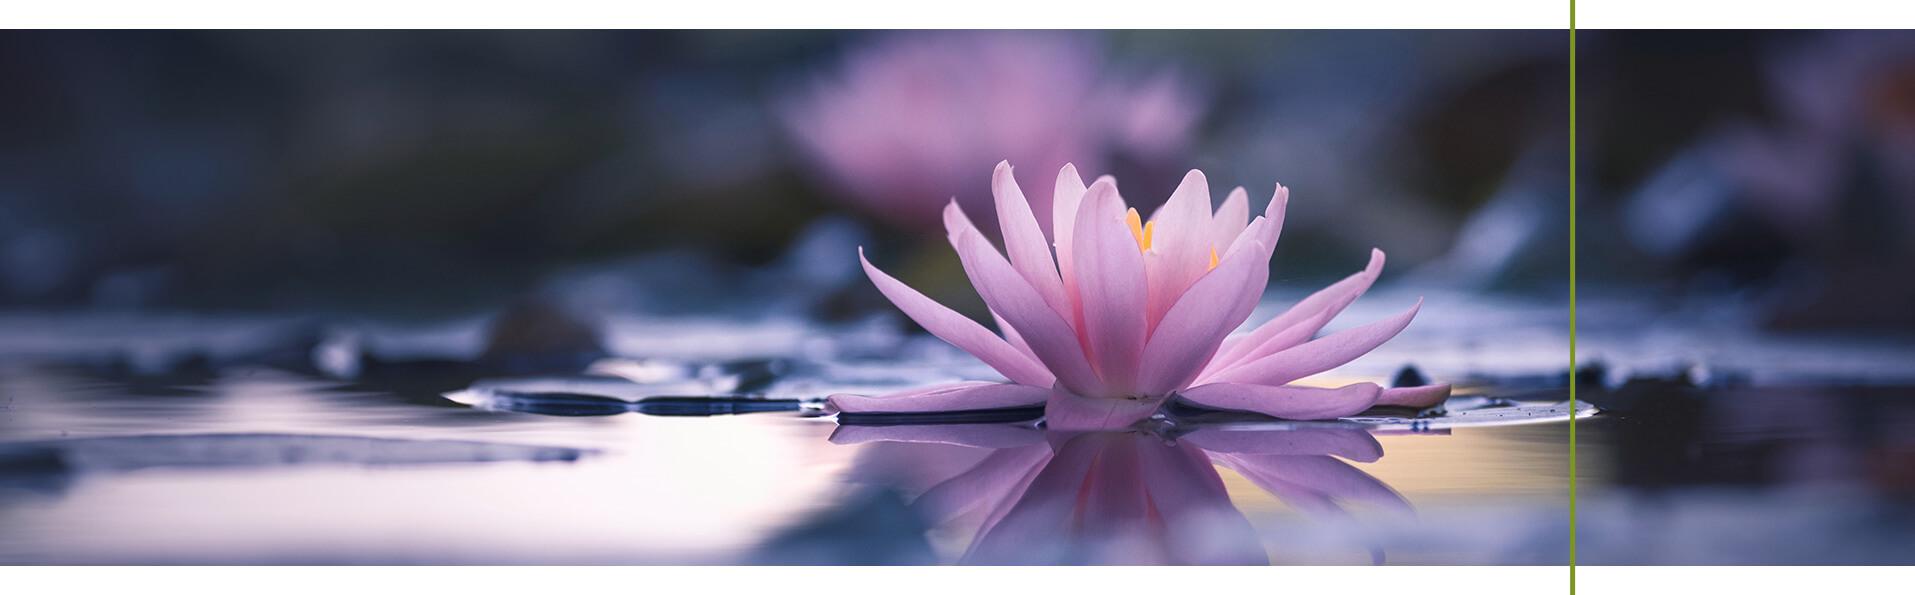 Inne superfood w naturalnych kosmetykach – centella asiatica i lotos